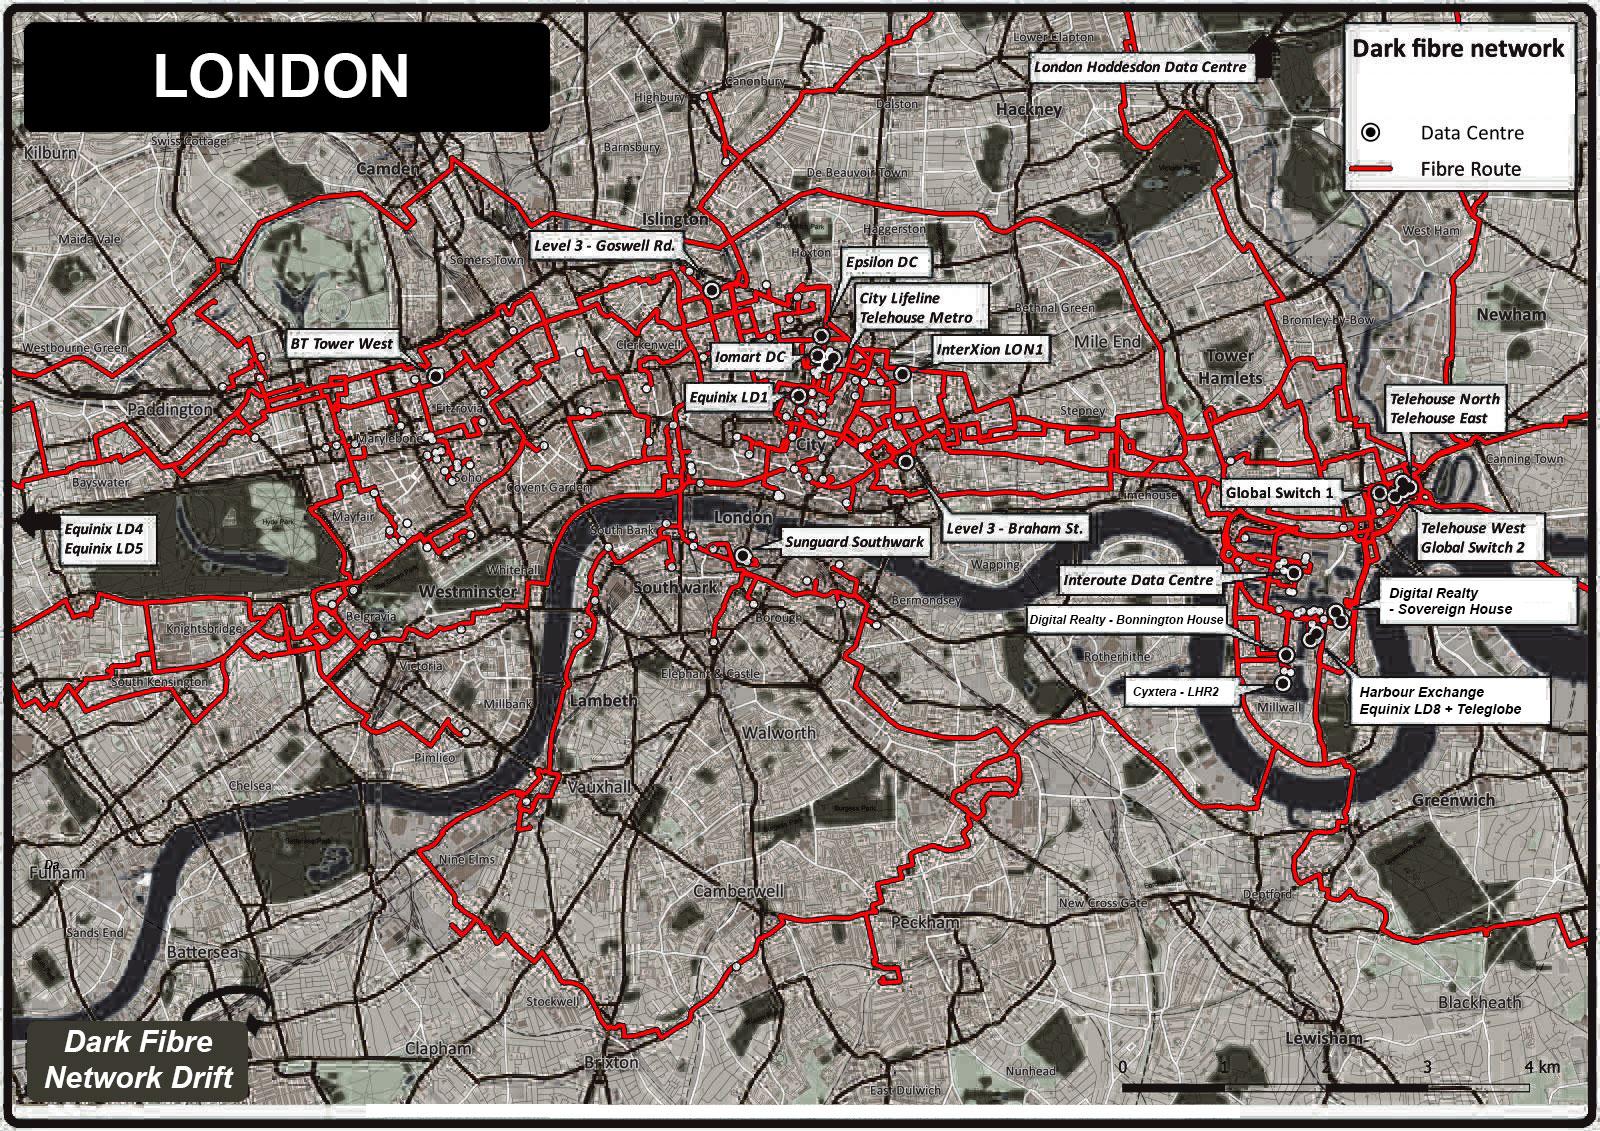 Map of the London Dark Fibre Network